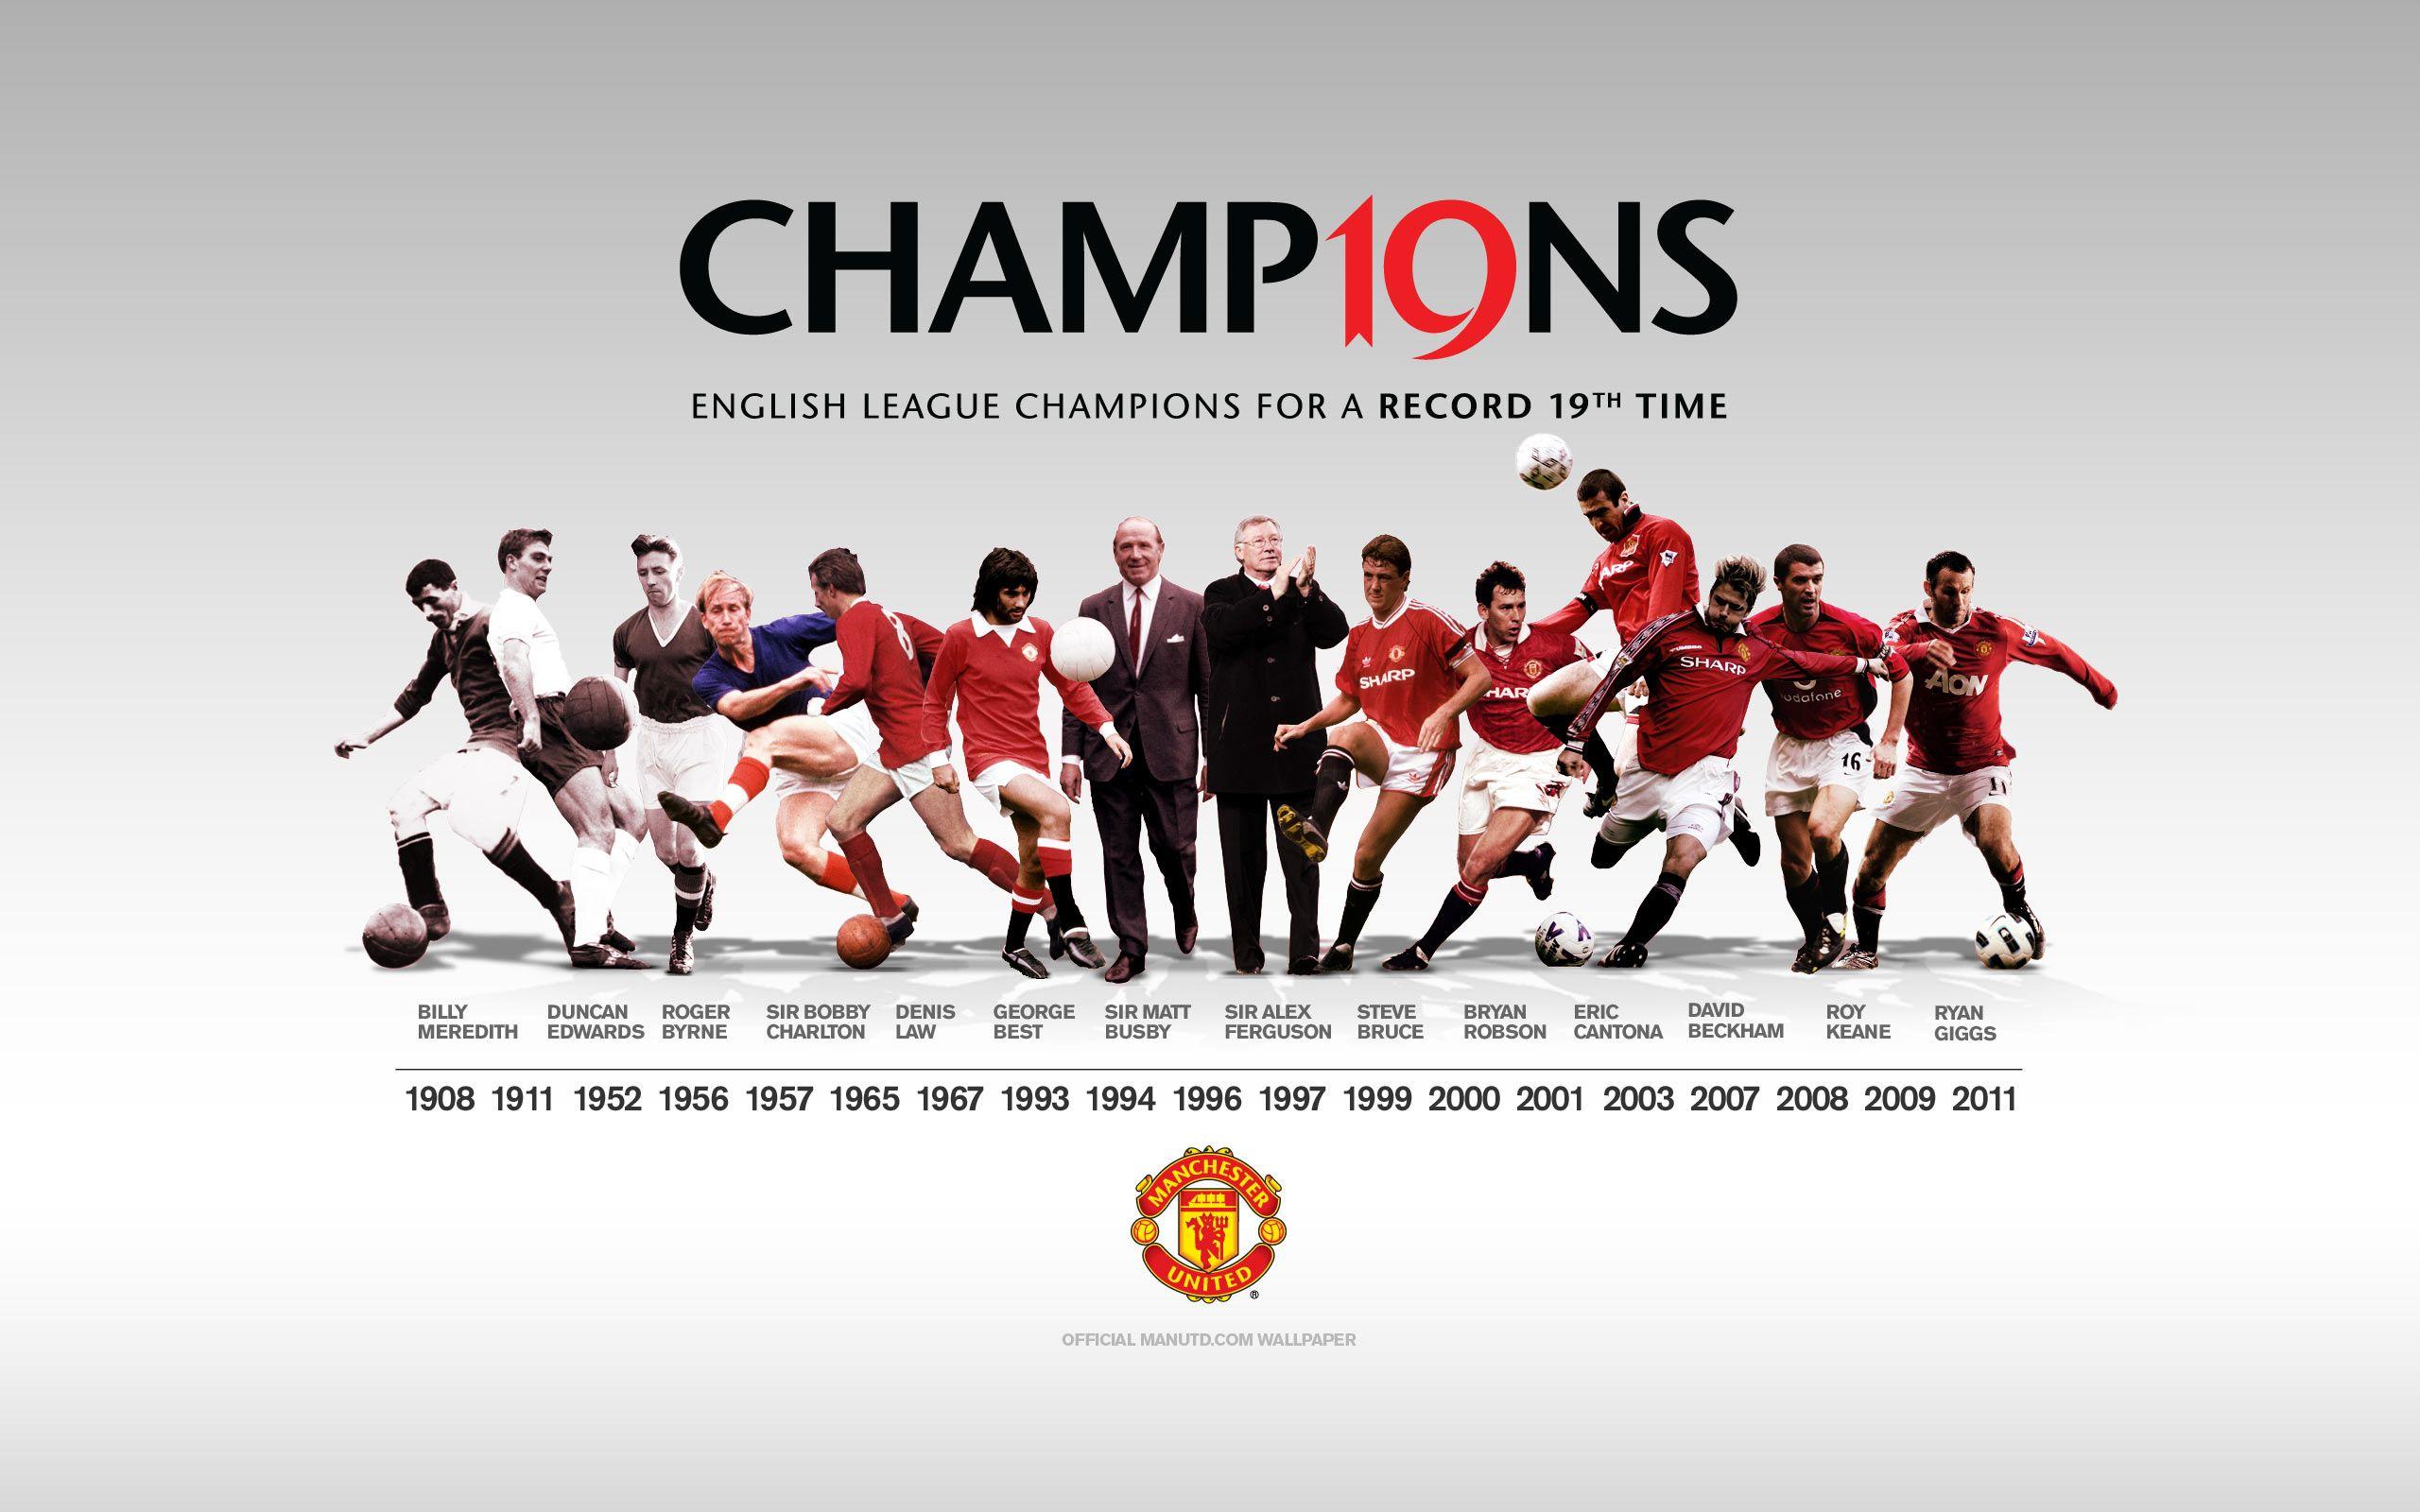 Manchester United 19 Times English Premier League Champions Manchester United Wallpaper Manchester United Champions Manchester United